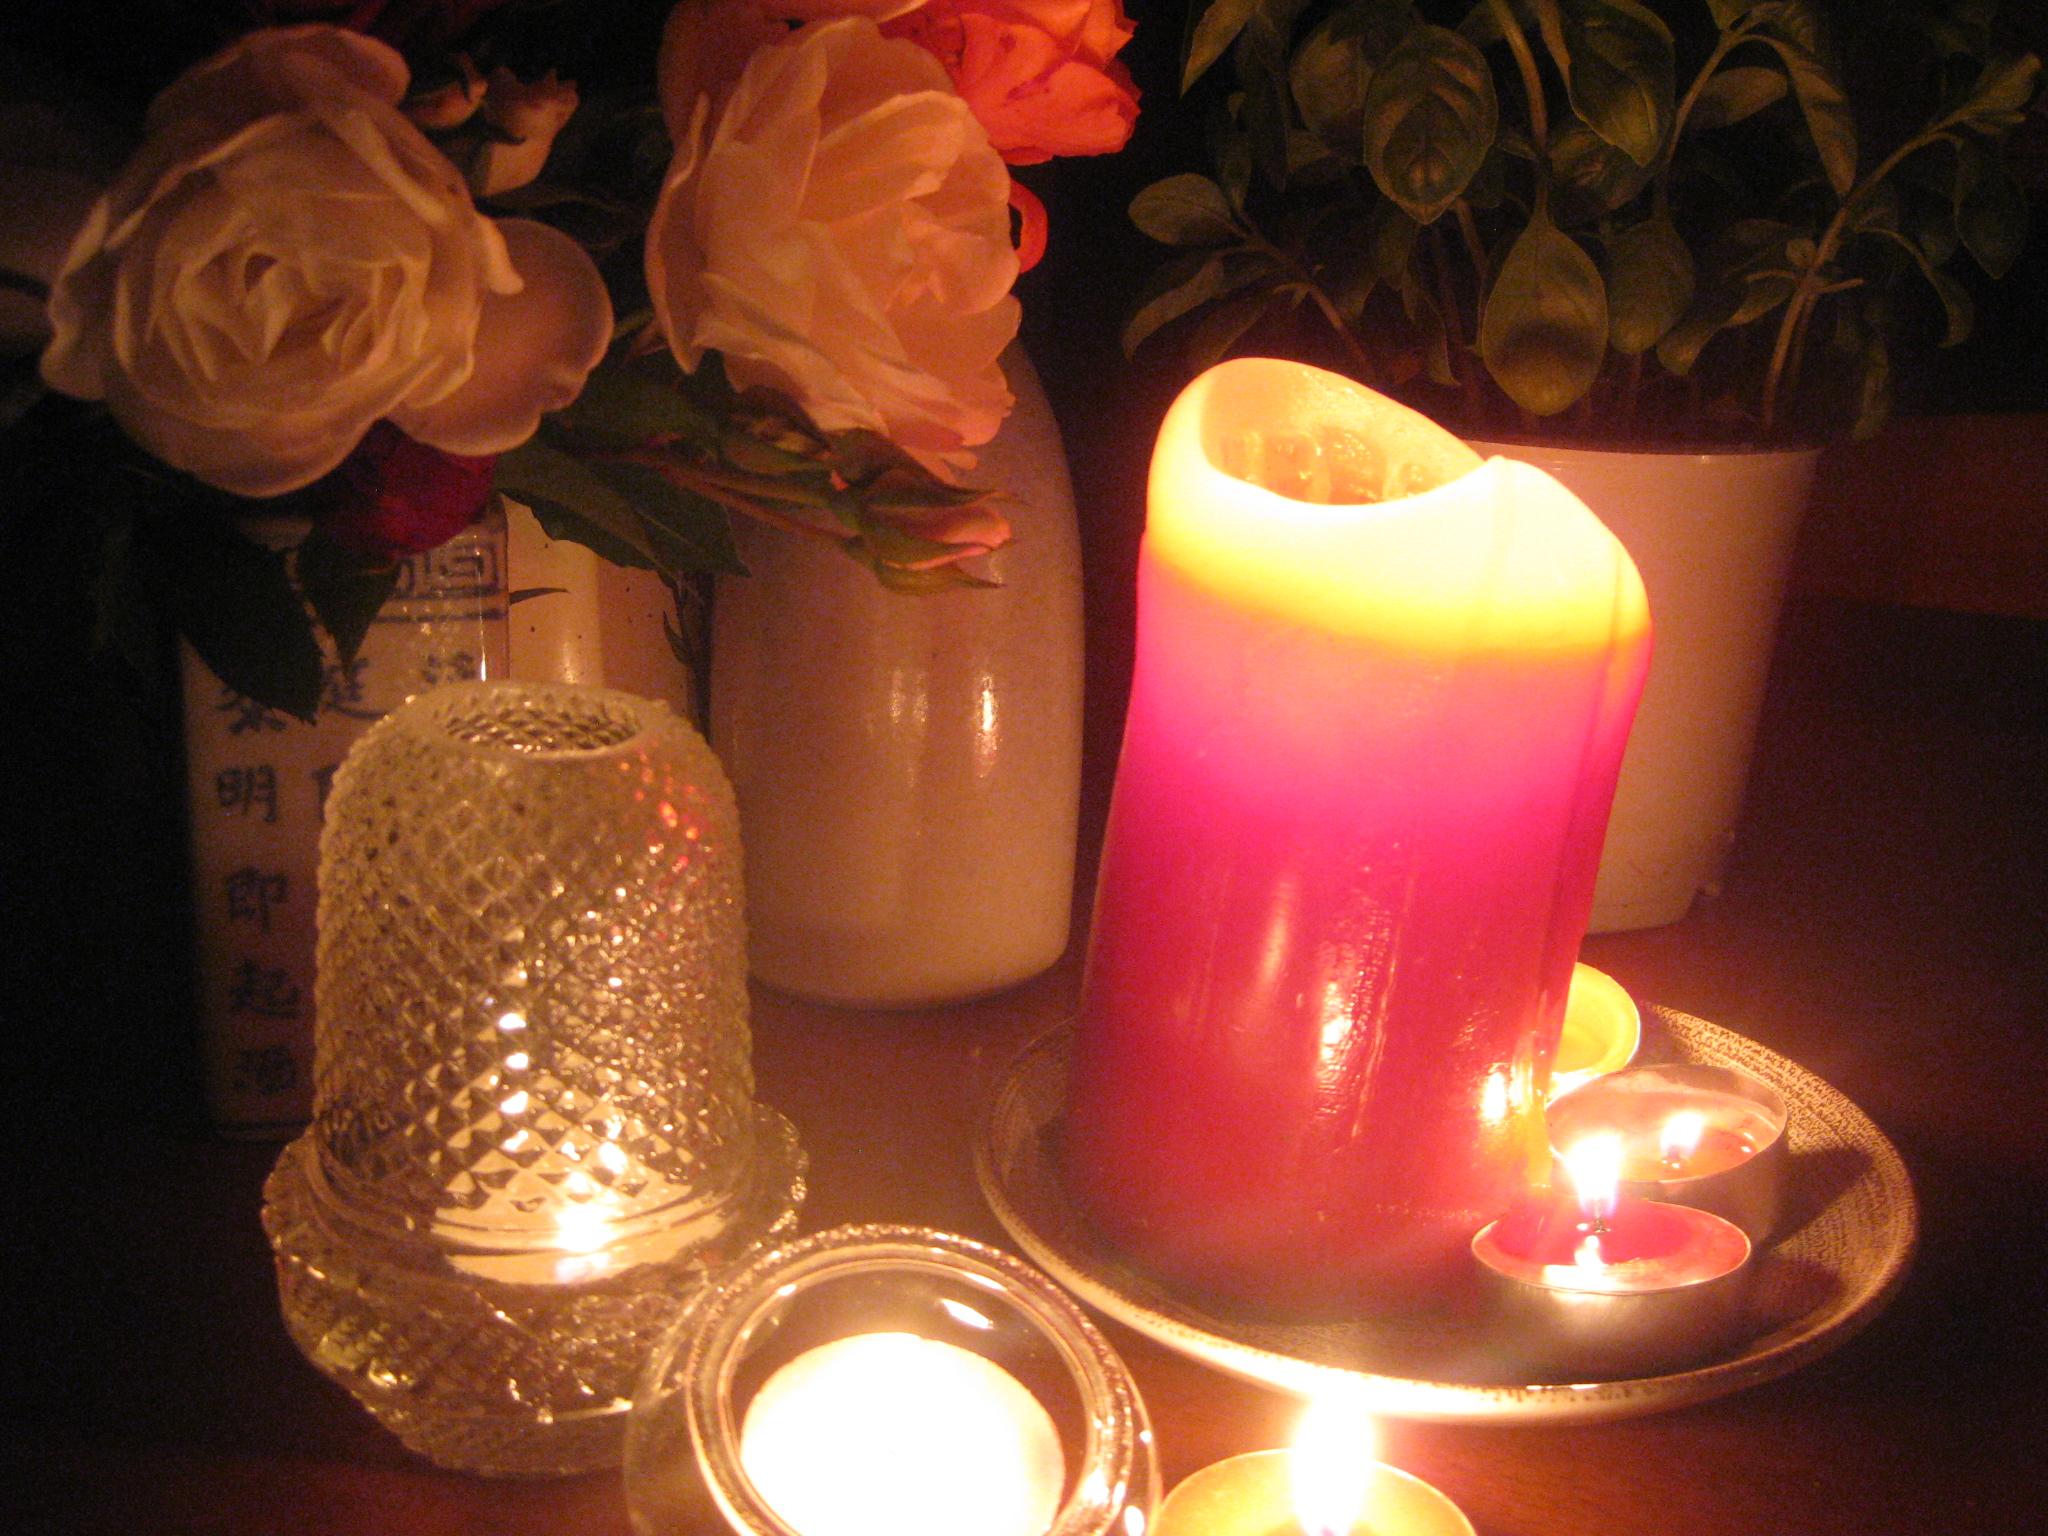 candlelight birthday dinner roses